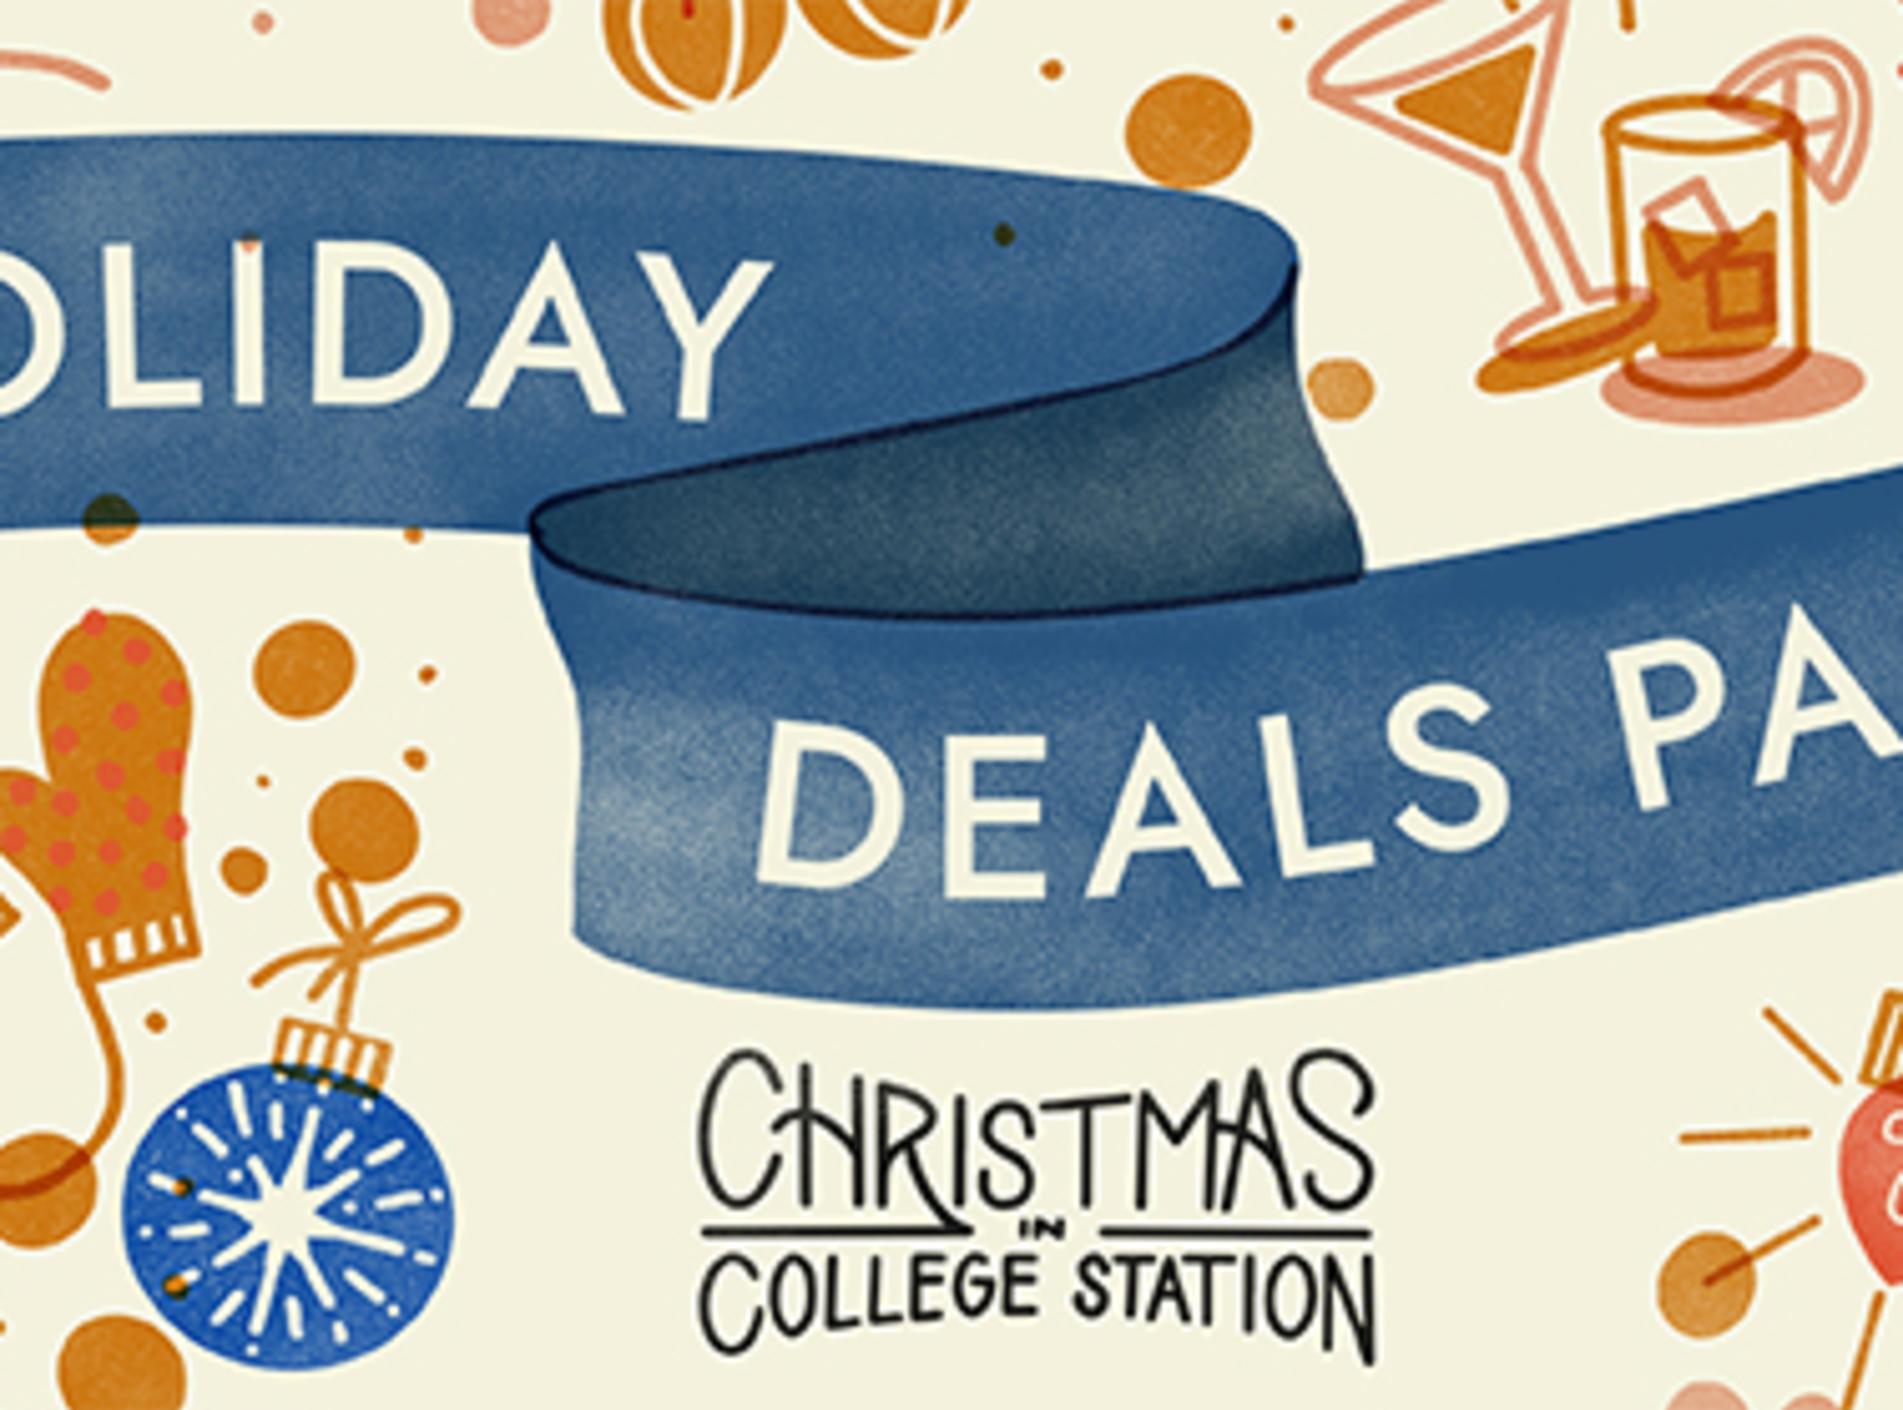 Holiday Deals Pass